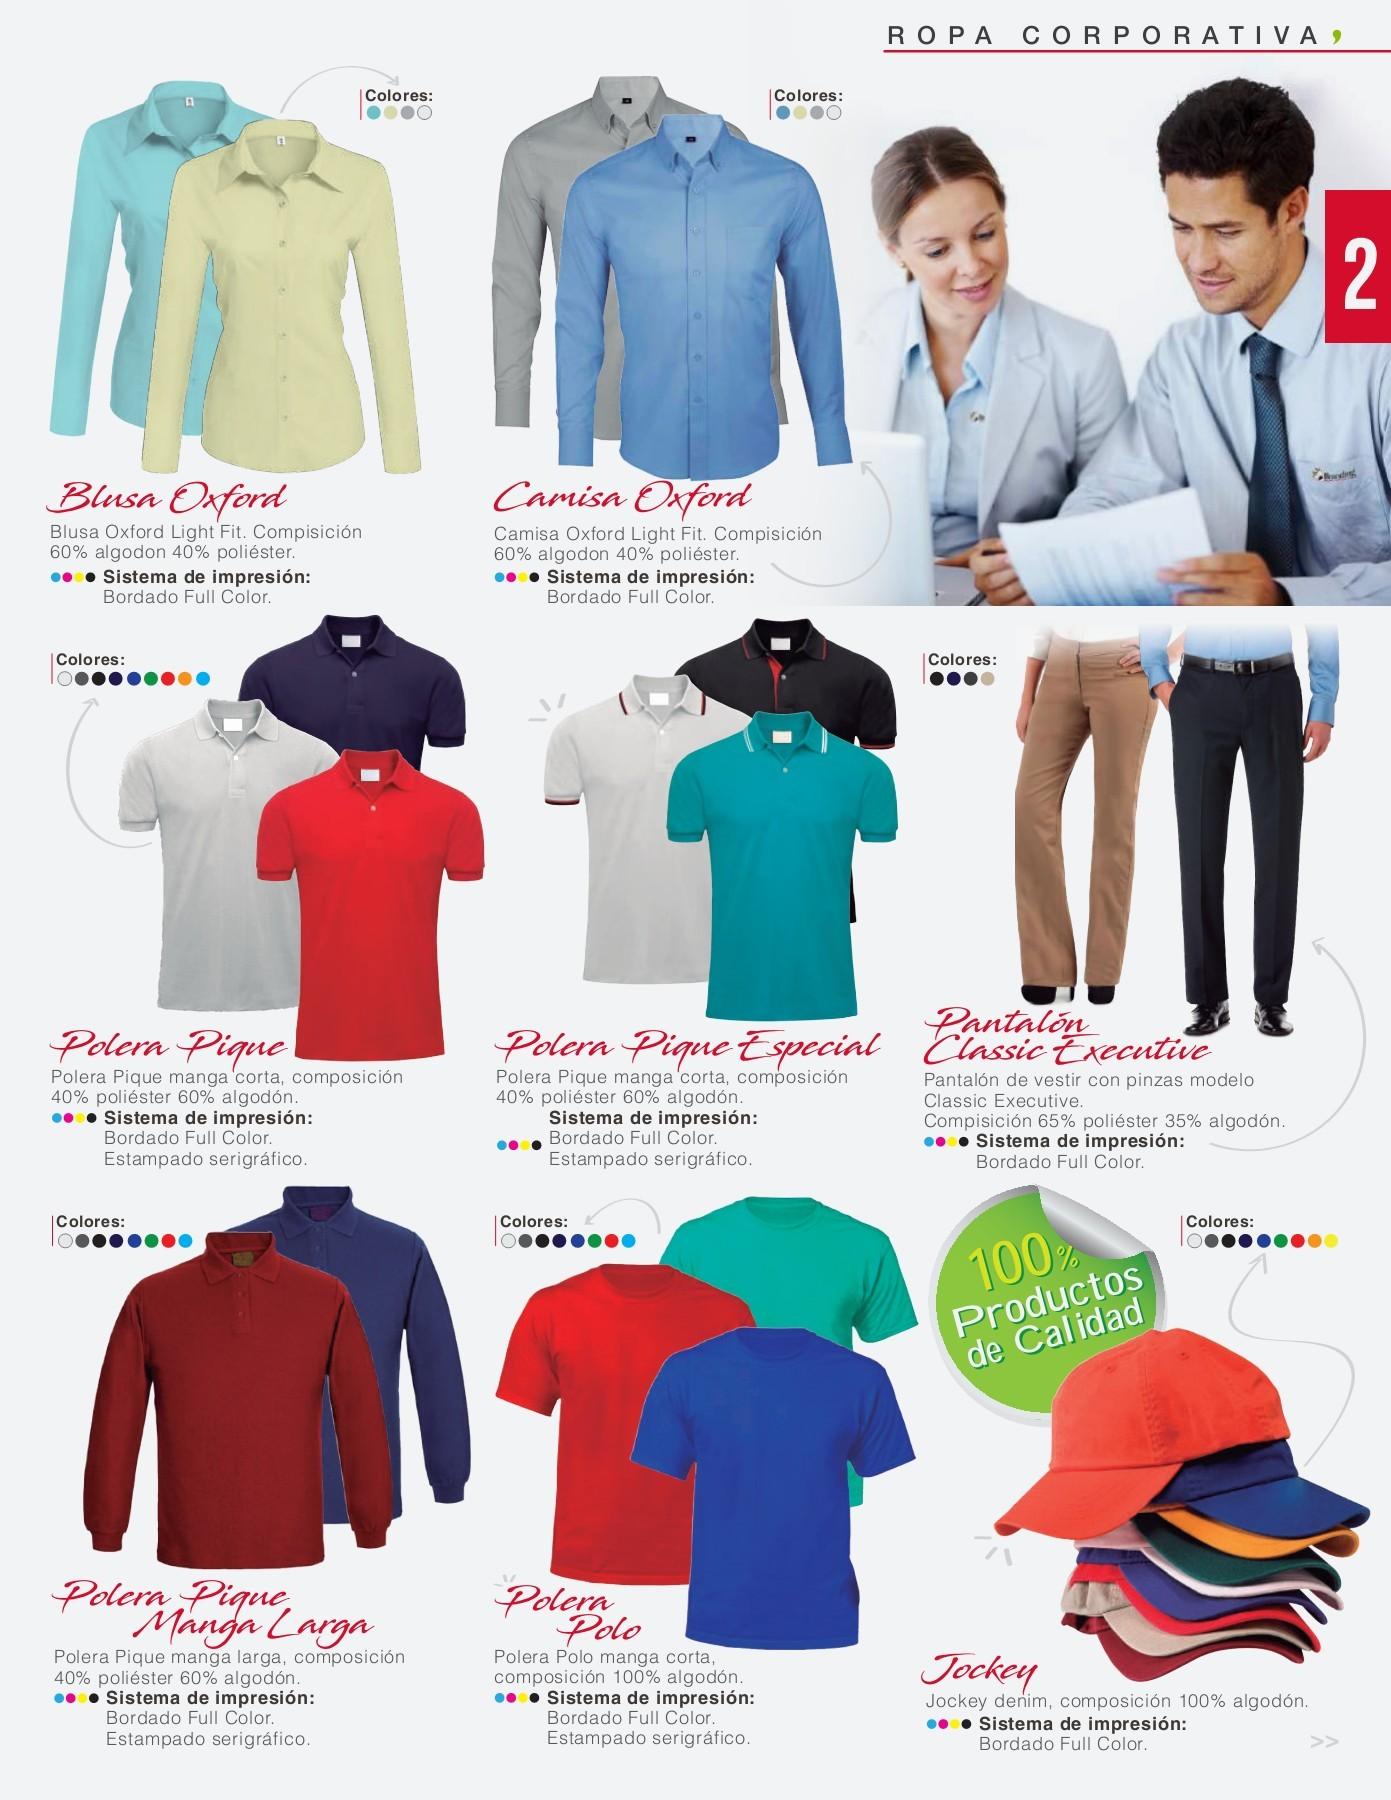 0450d6fcfe5d70 Branding Corporativo CATALOGO ROPA CORPORATIVO | PubHTML5